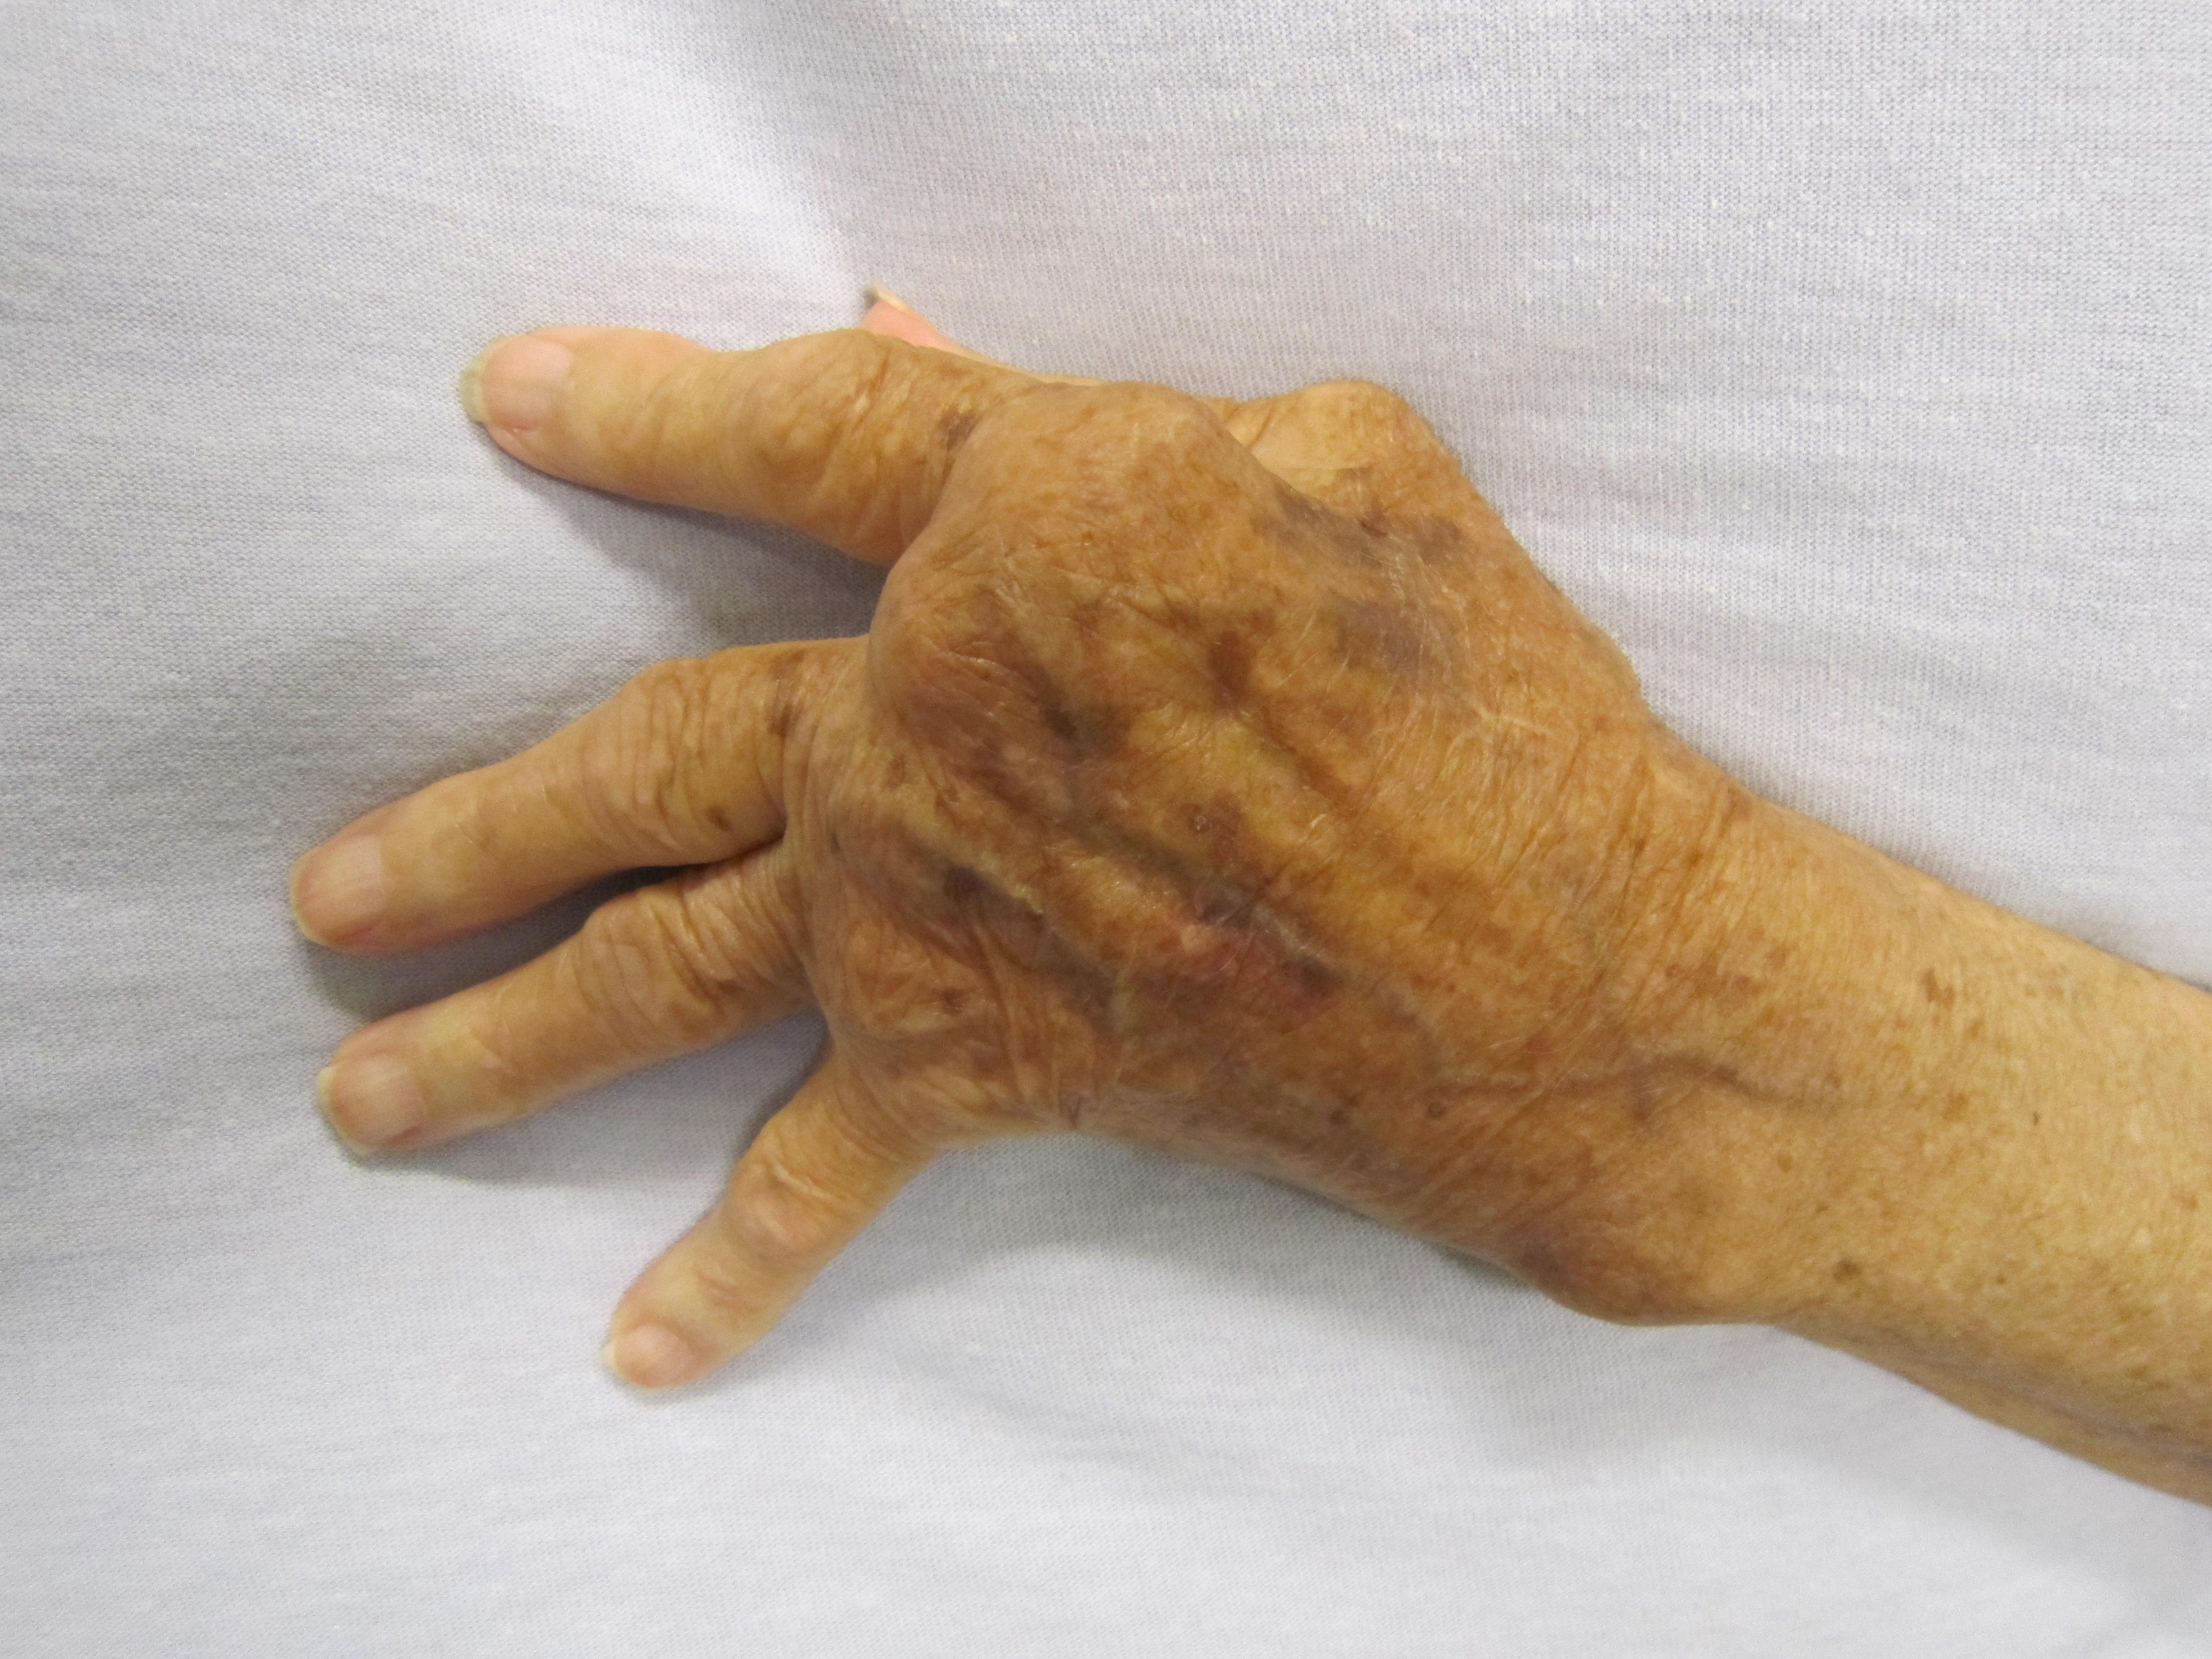 a boka periartritiszét, aki kezeli